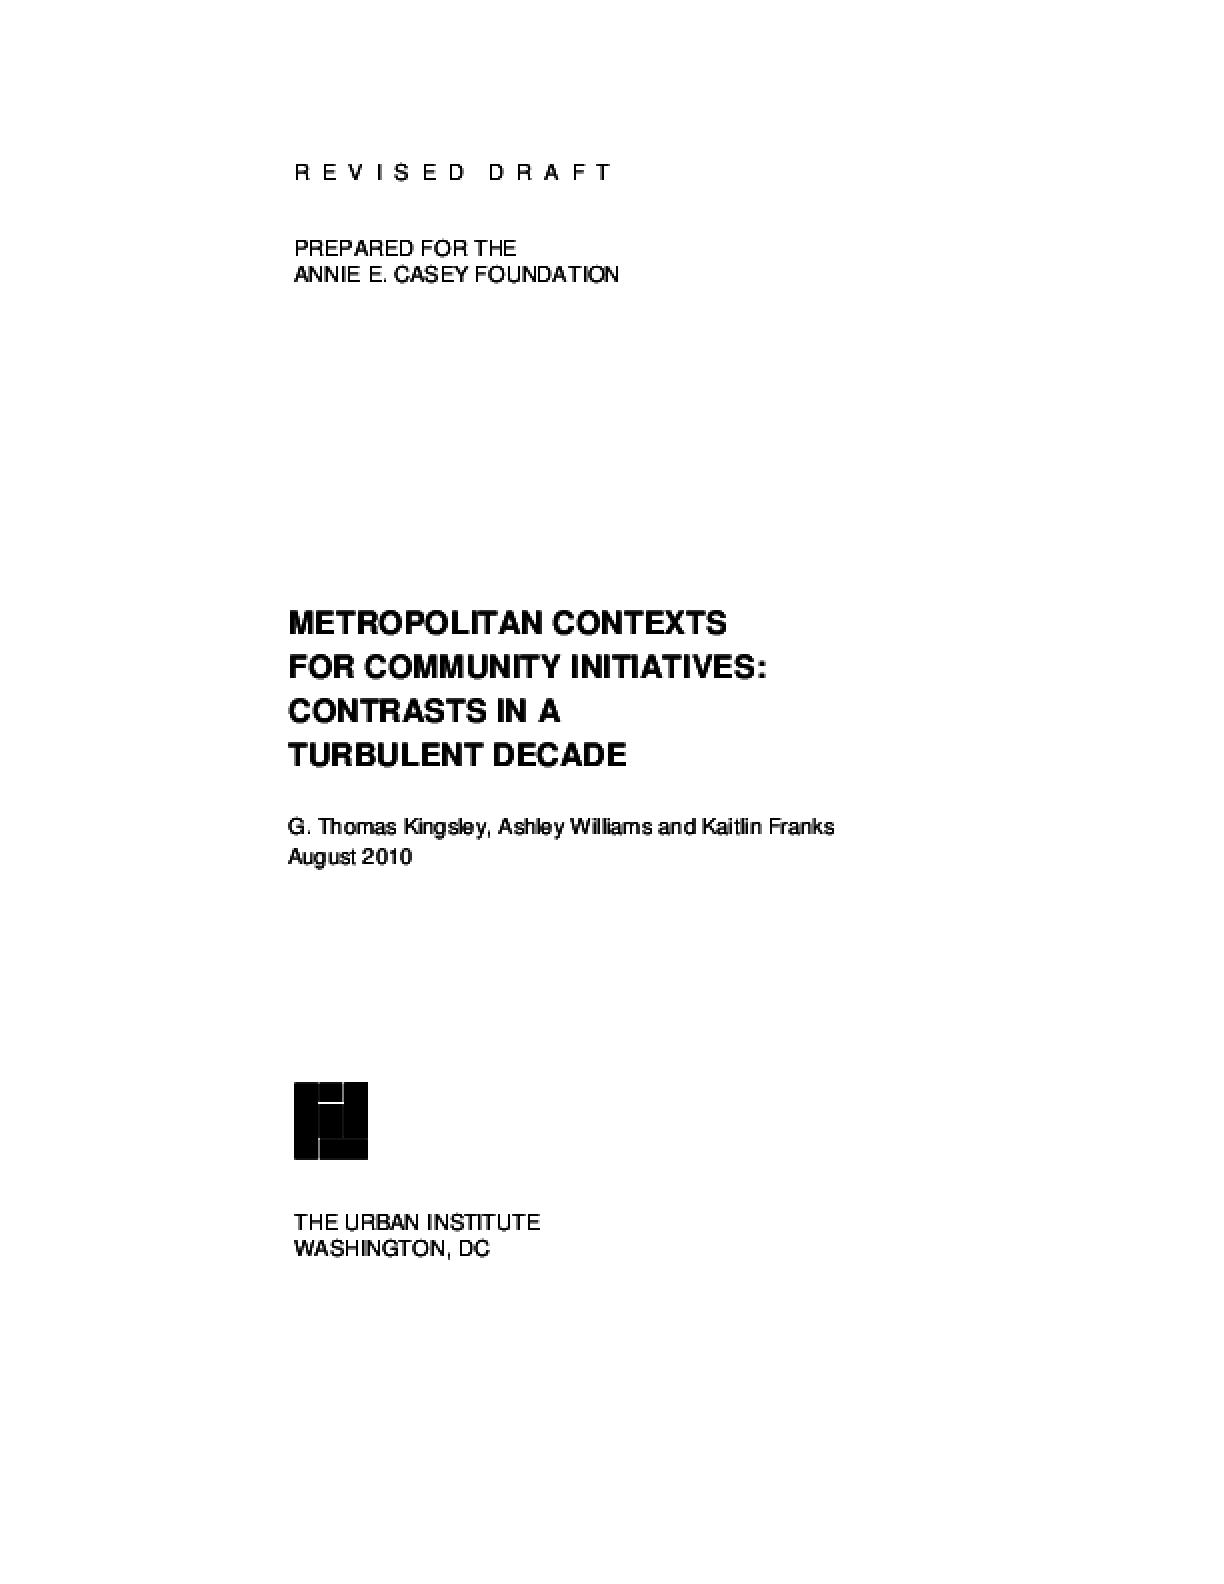 Metropolitan Contexts for Community Initiatives: Contrasts in a Turbulent Decade